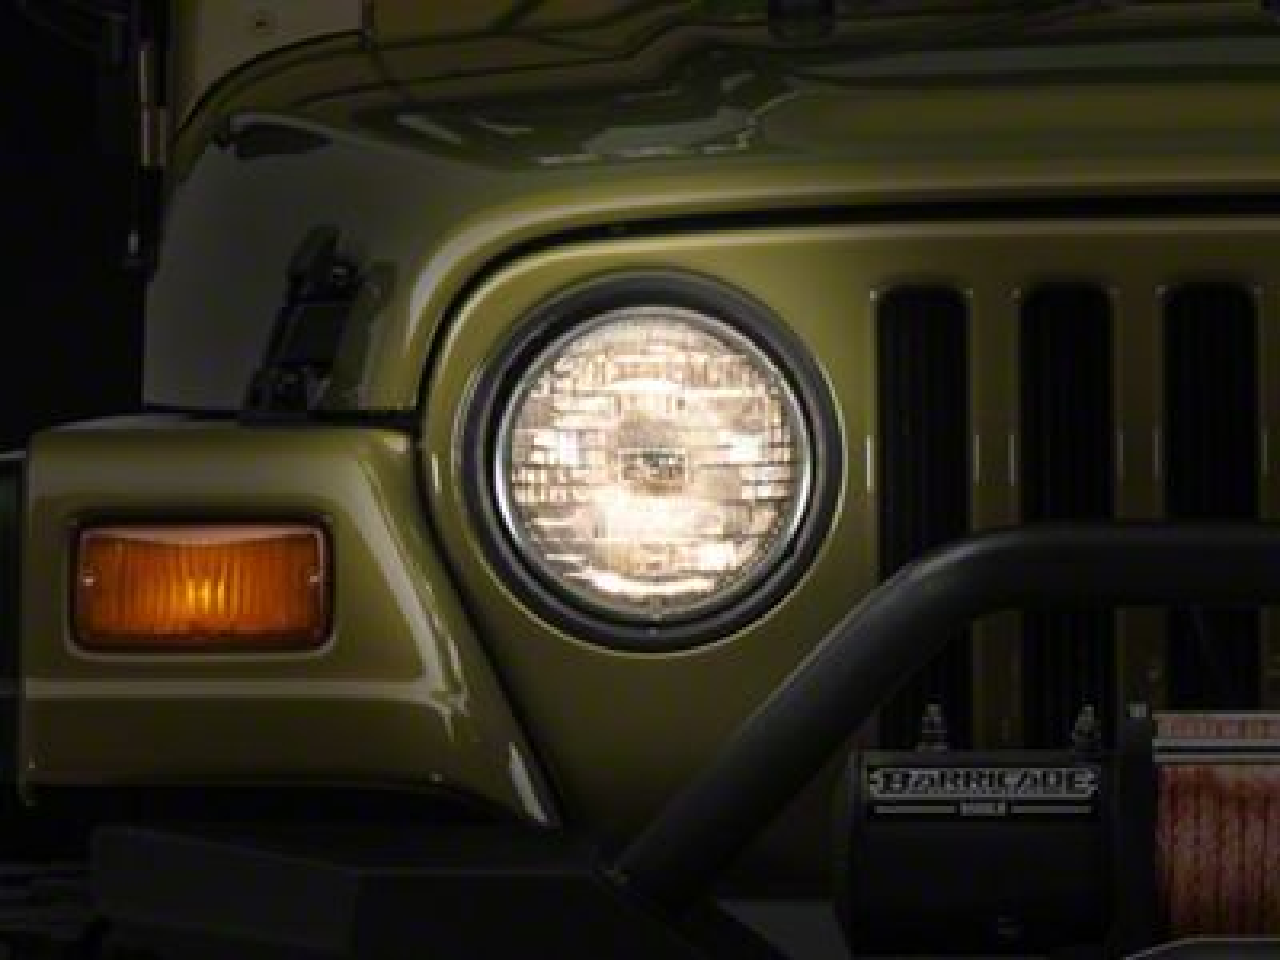 Axial Jeep Wrangler Headlight Led Conversion Bulb Kit J103153 97 06 Jeep Wrangler Tj